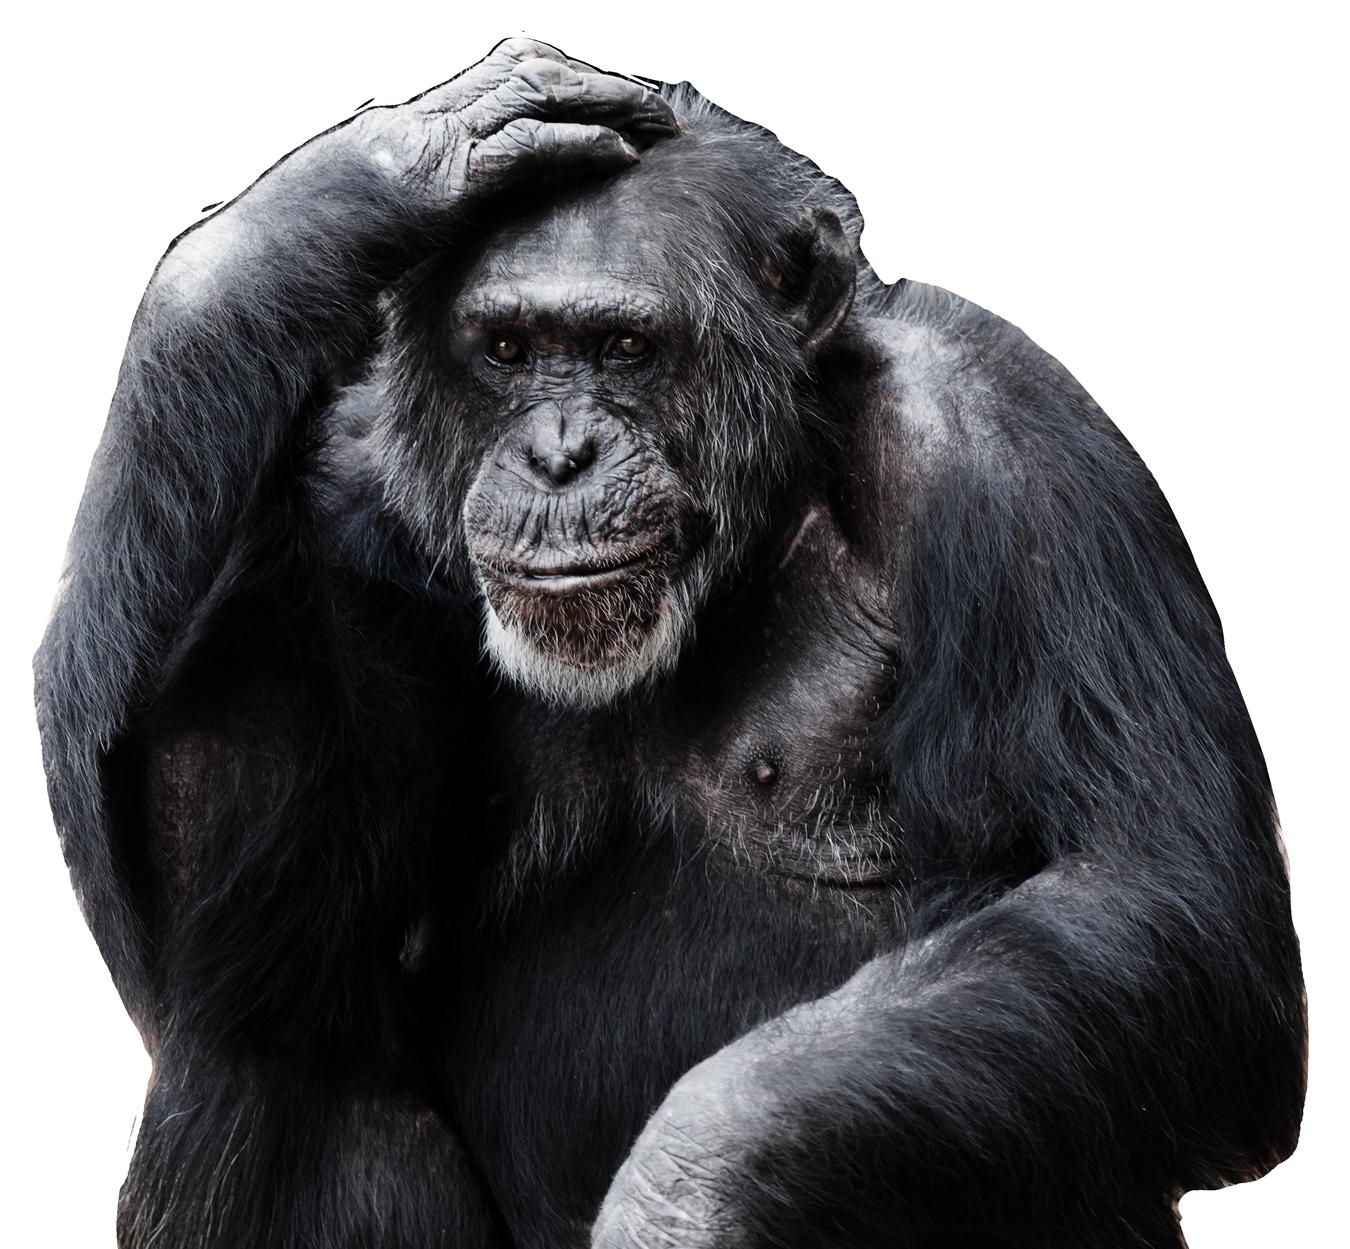 Gorilla PNG - 12150